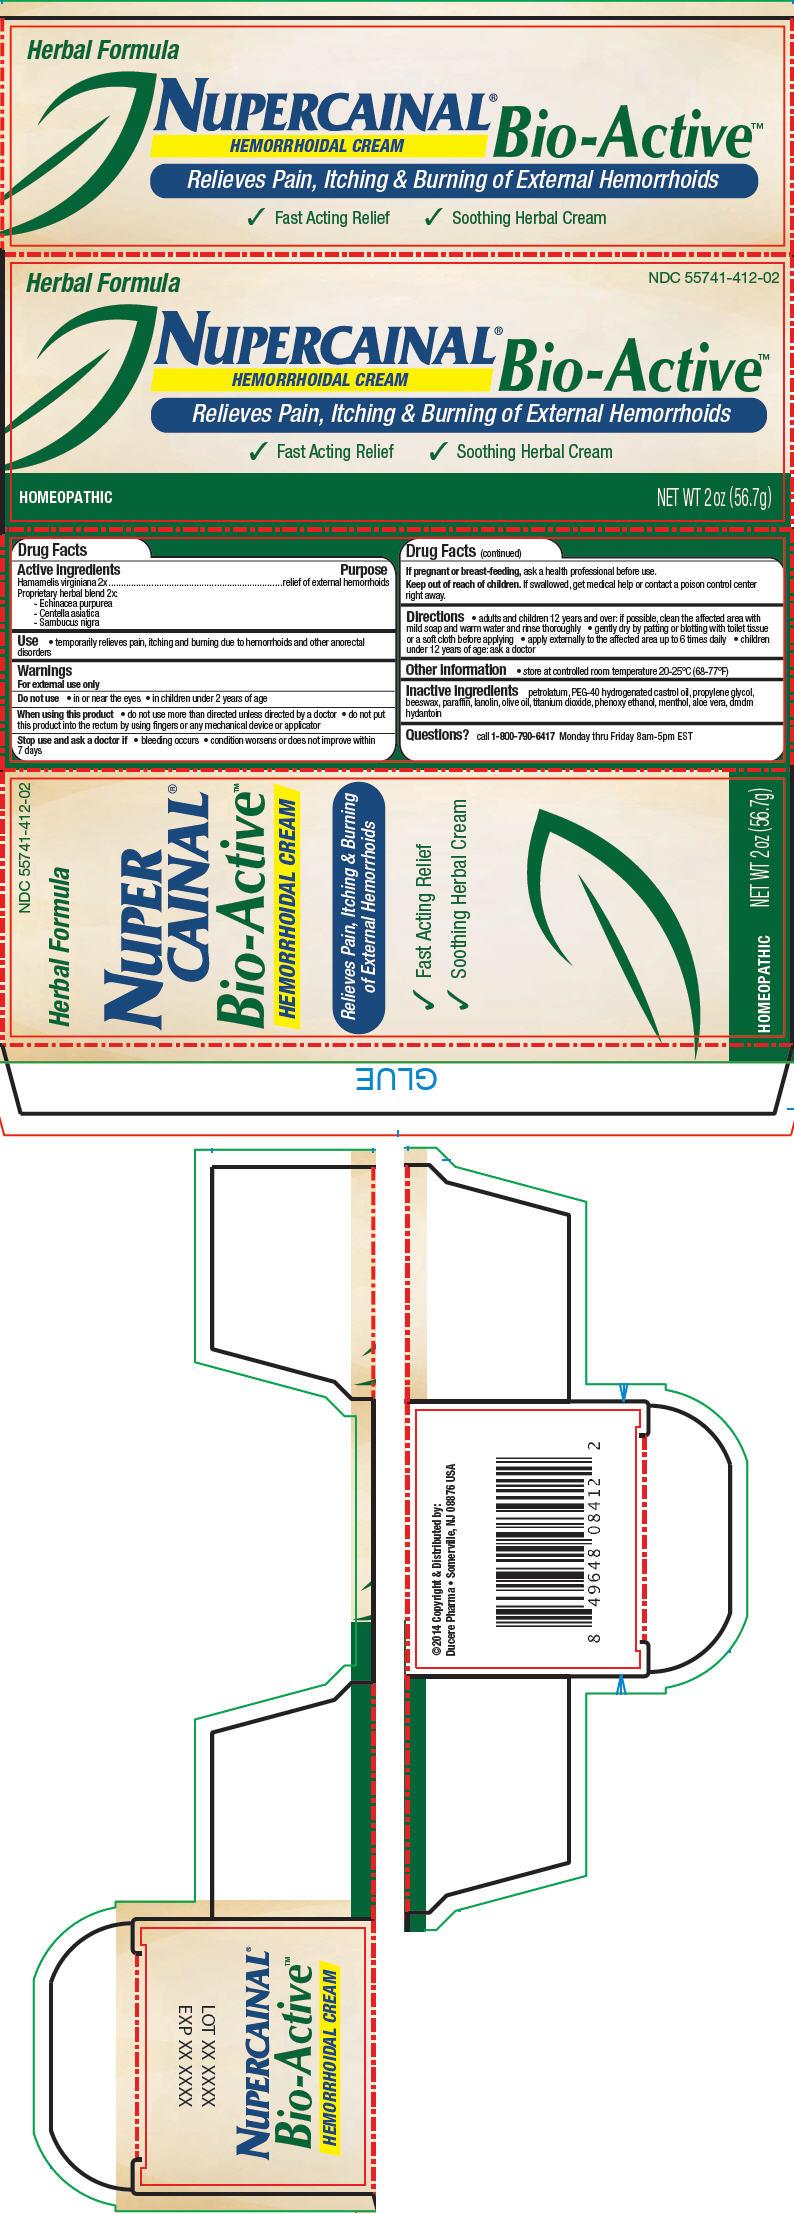 Nupercainal Bio-active Hemorrhoidal (Hamamelis Virginiana Root Bark/stem Bark, Echinacea Purpurea, Centella Asiatica, And Sambucus Nigra Flowering Top) Cream [Ducere Pharma]